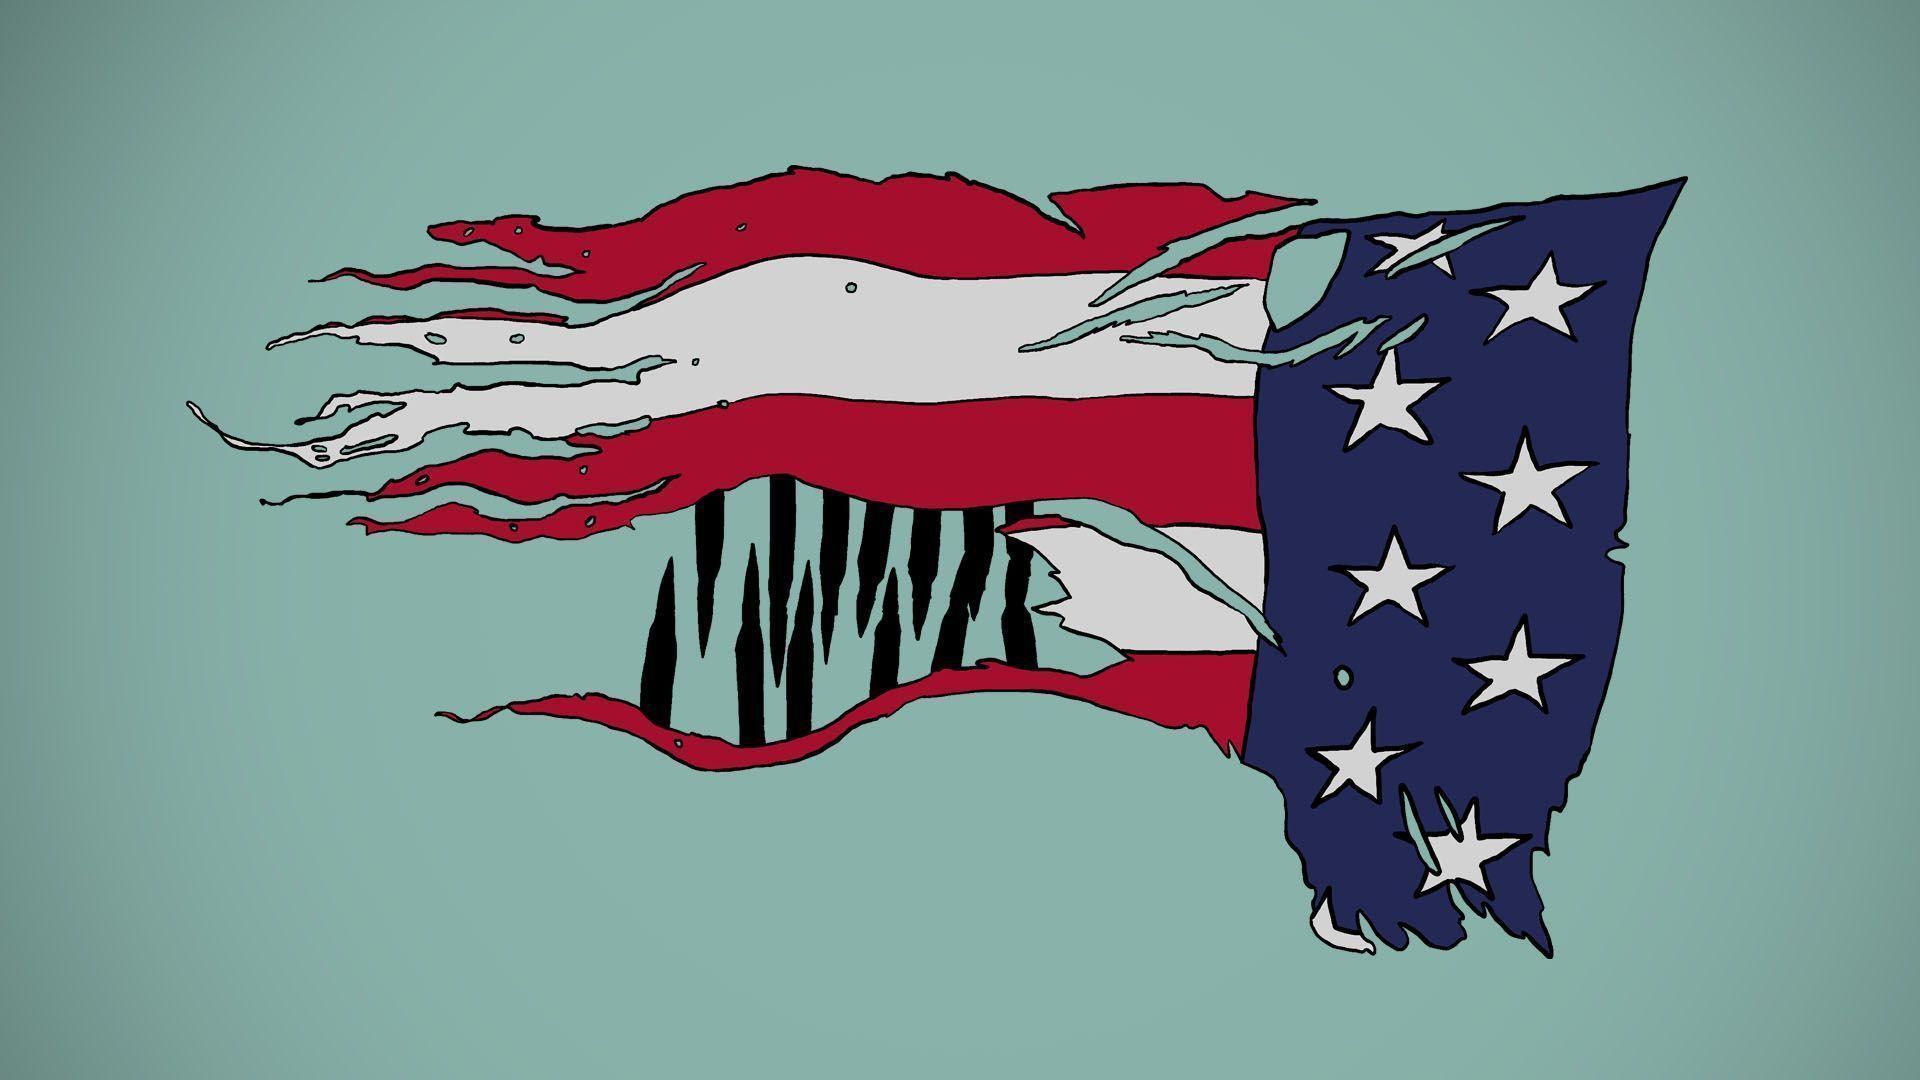 USA flag wallpaper 1080p by lechmarcin on DeviantArt